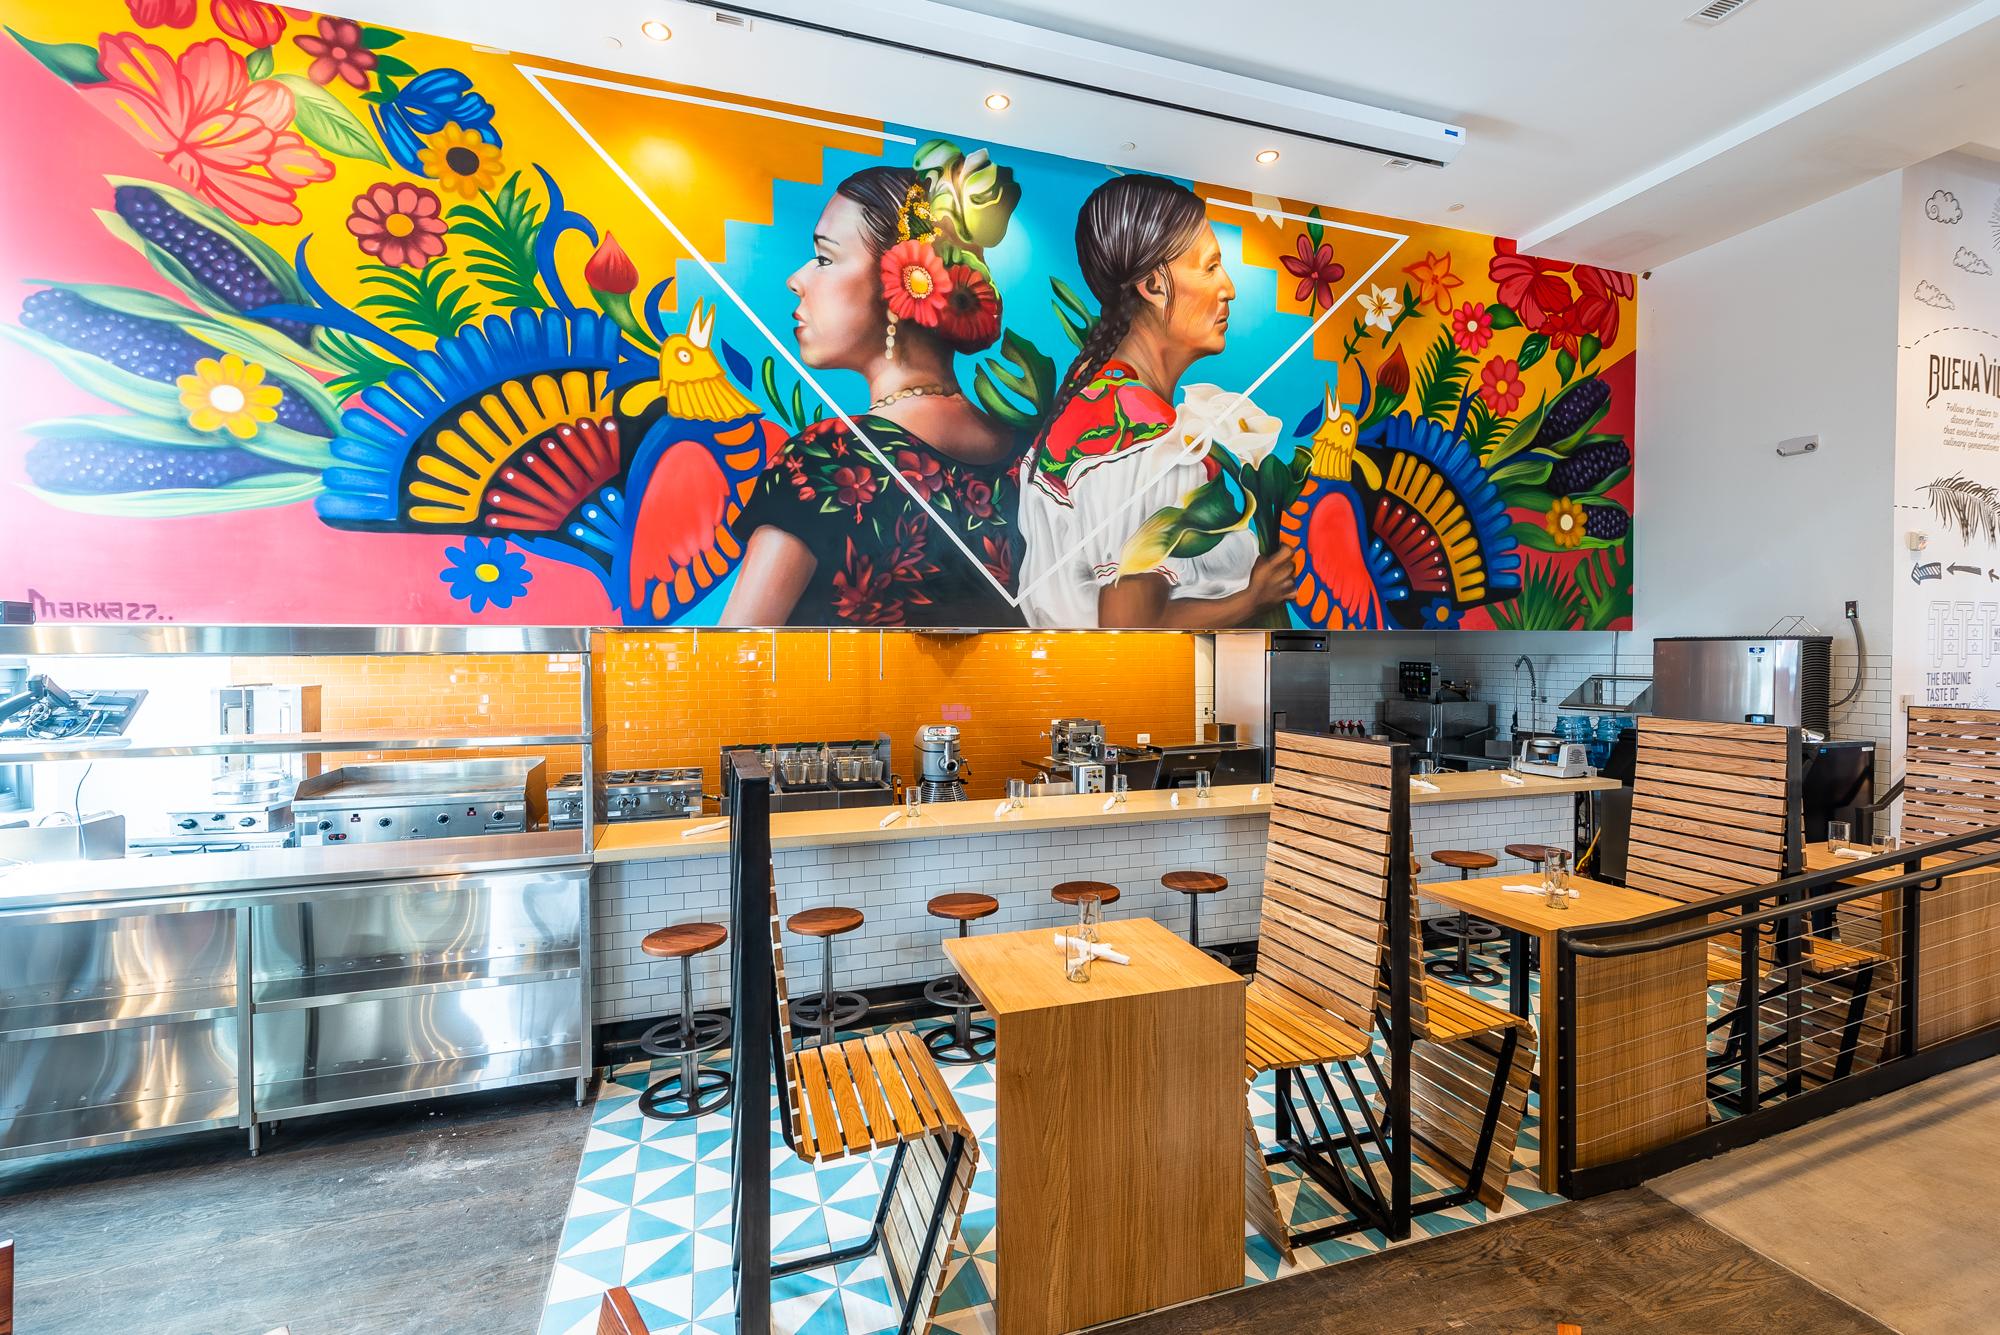 Chef Behind CDMX's Best Restaurant Opens Mexican Spots in Clarendon